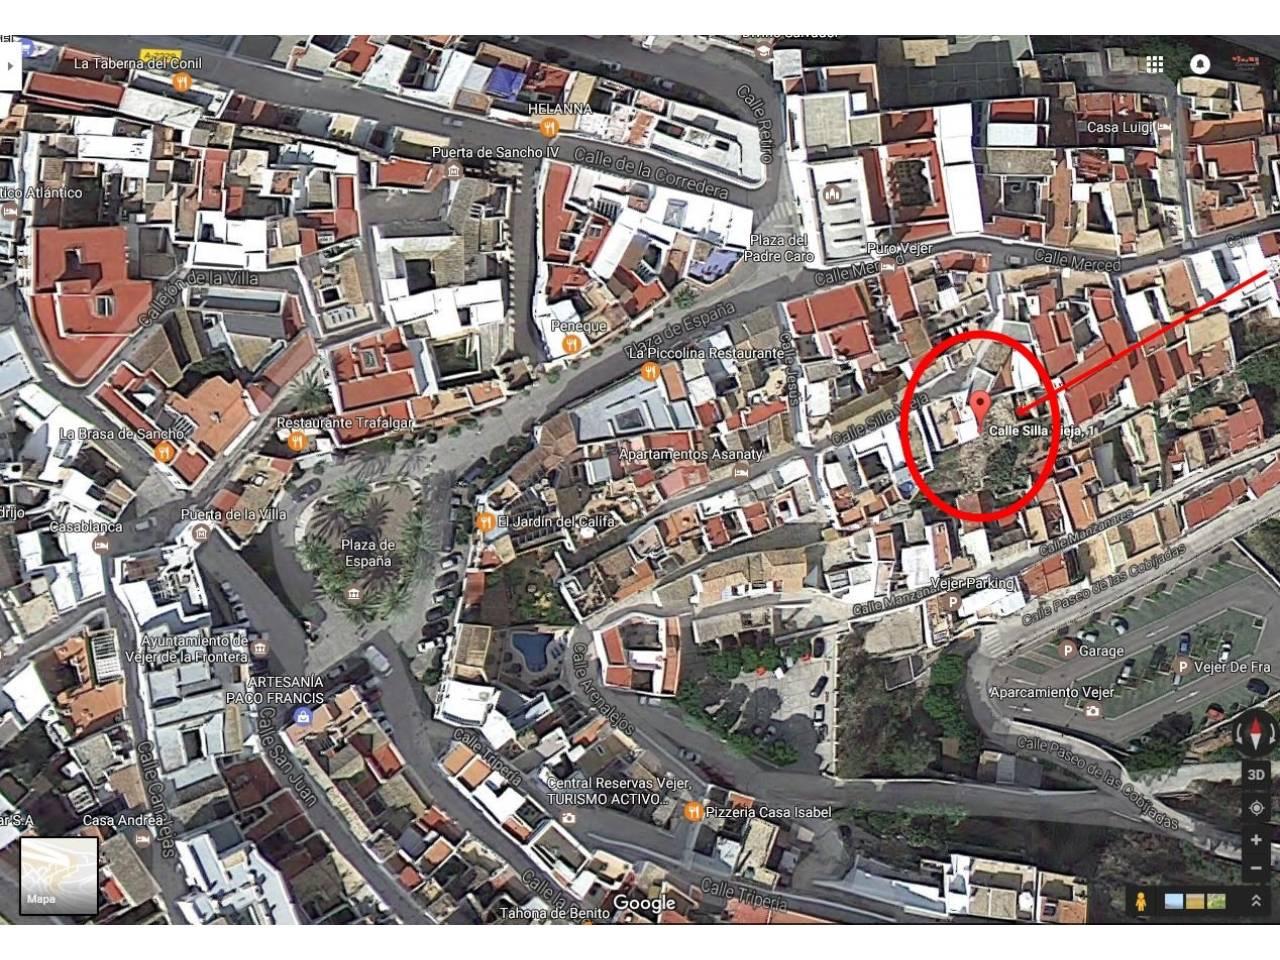 Imagen 20 de House, Apartment and Plot to build in the historic center of Vejer de la Frontera